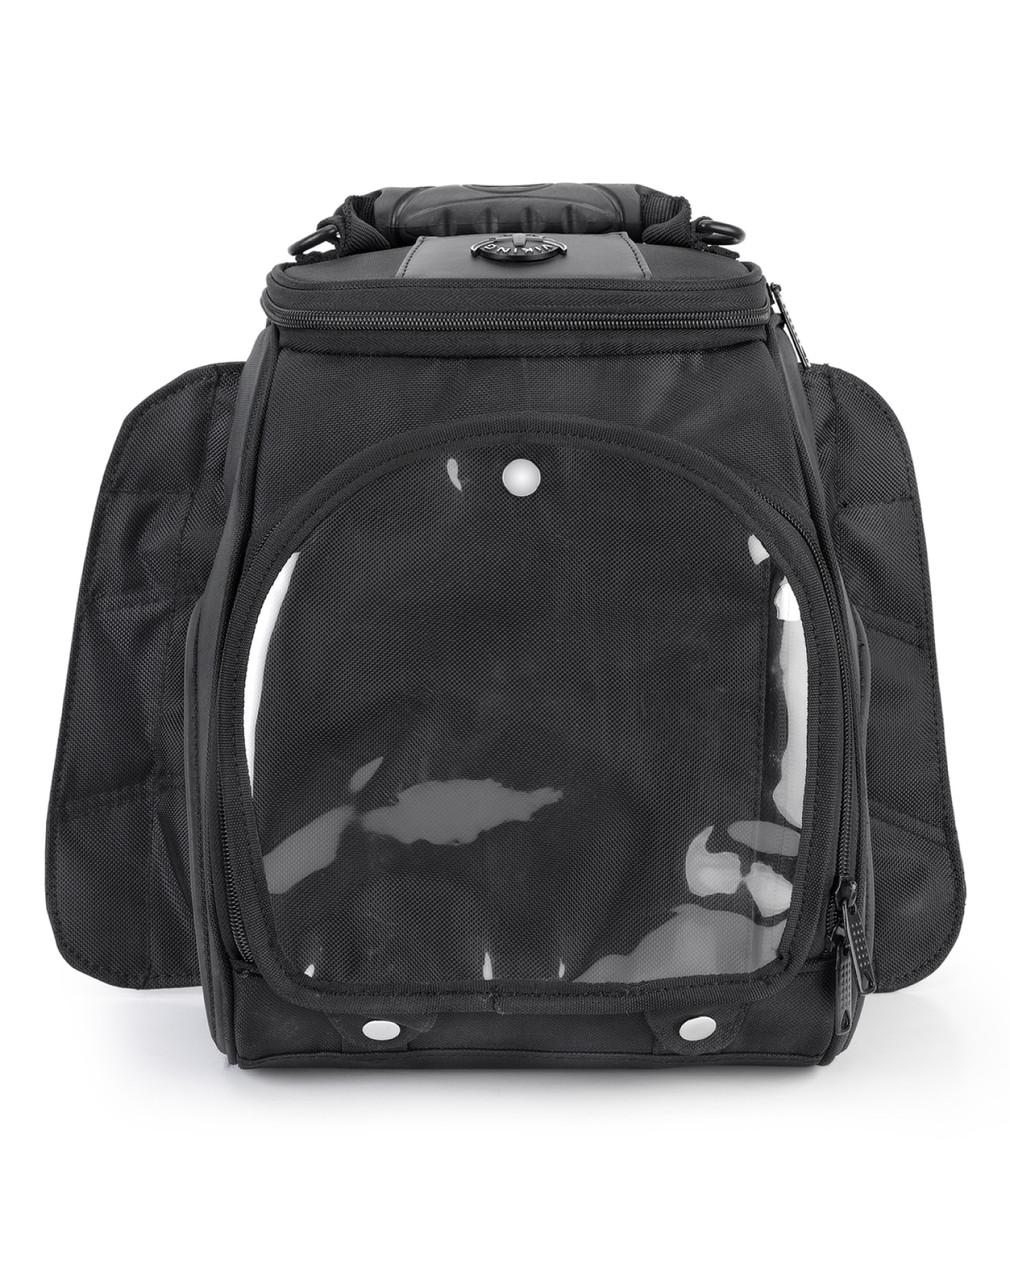 Viking 14 Medium Black Street/Sportbike Tank Bag Front View